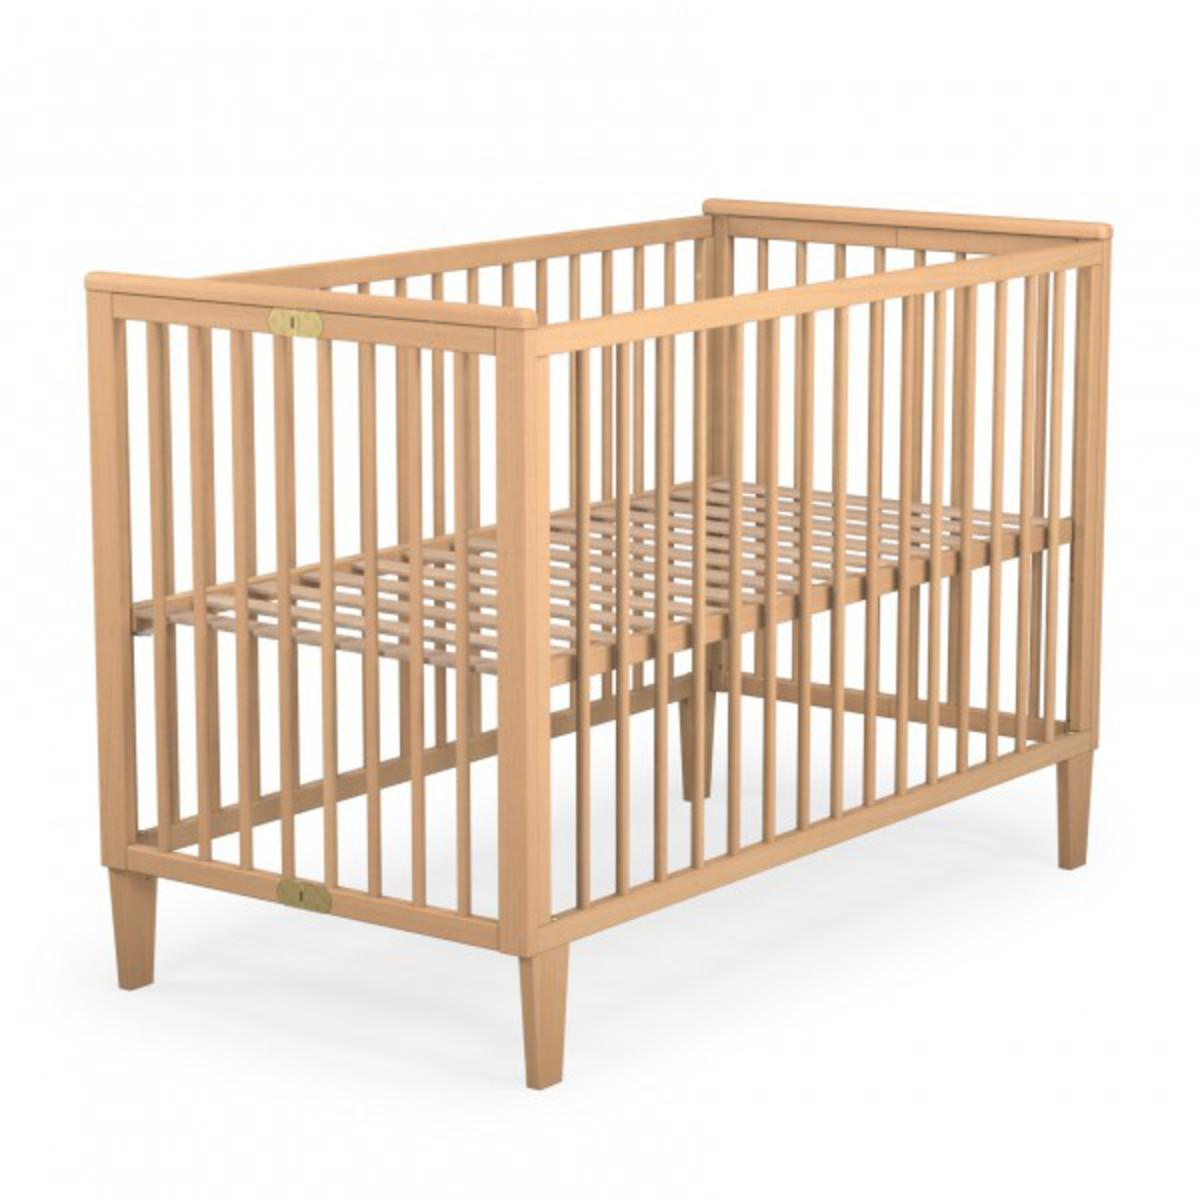 jurababy lit pliant h tre massif 60 x 120 naturel lit b b jurababy sur l 39 armoire de b b. Black Bedroom Furniture Sets. Home Design Ideas